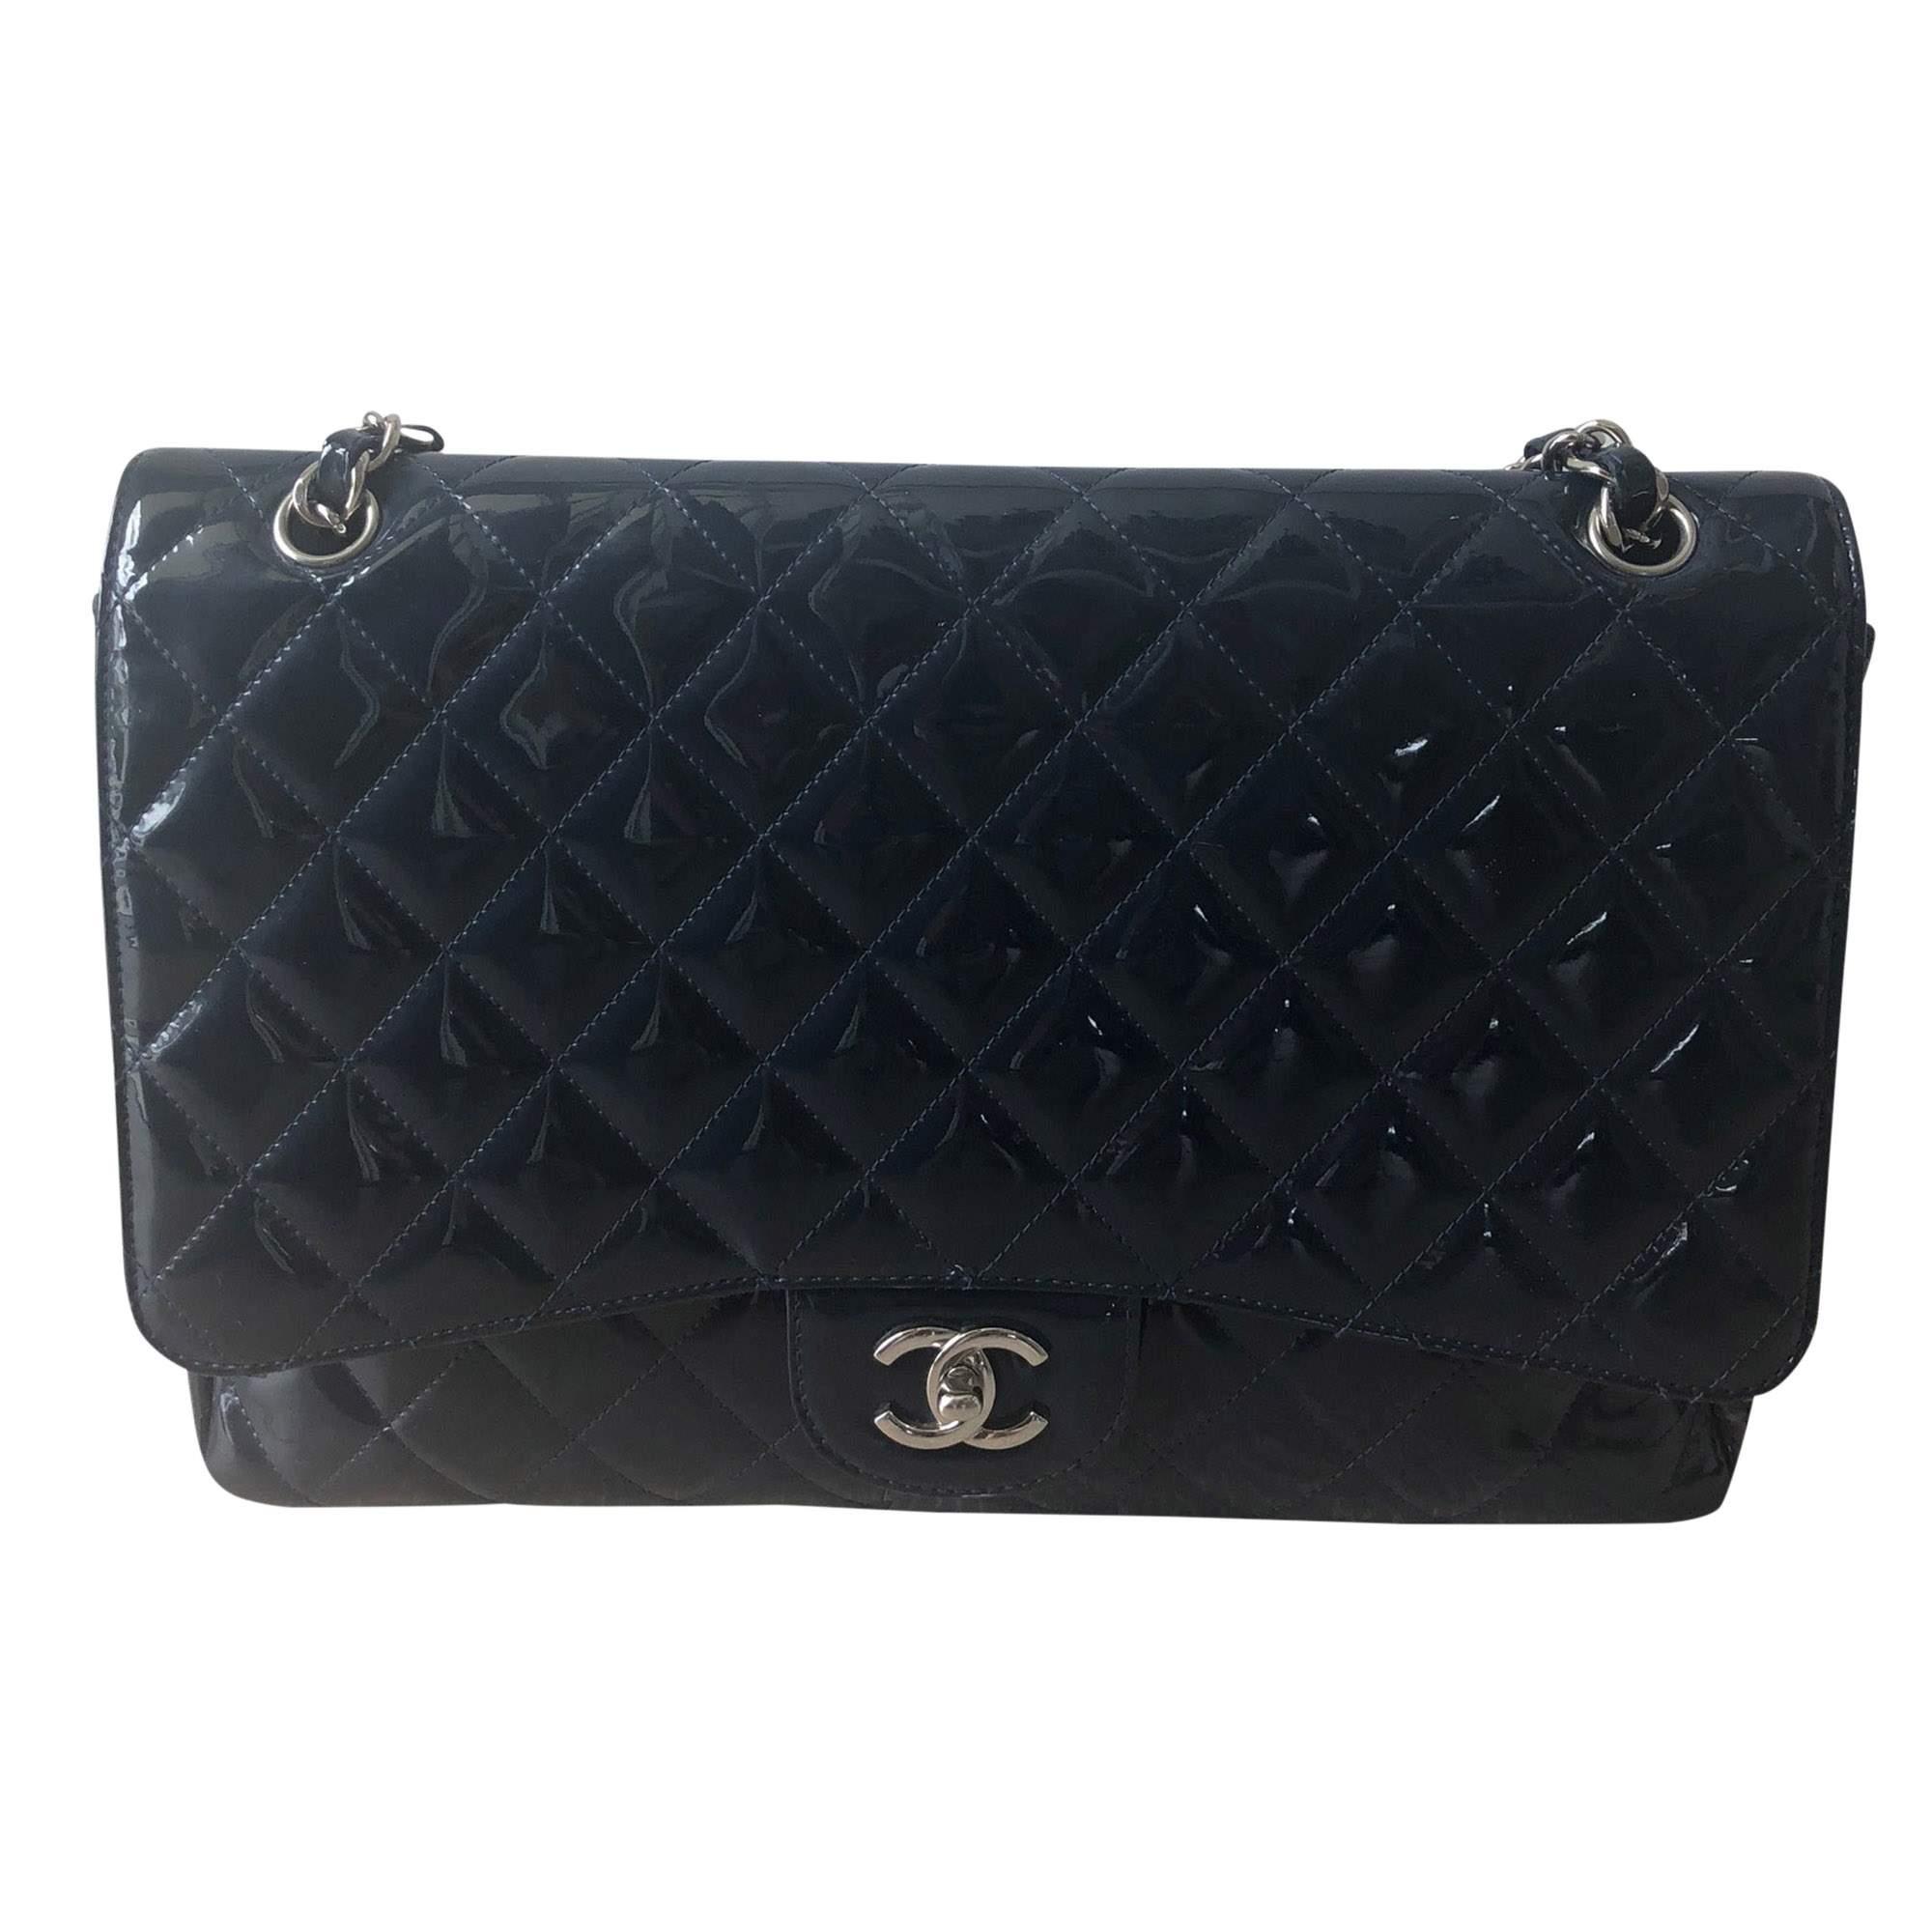 637720ec562b Chanel Maxi Jumbo handbag | The Chic Selection